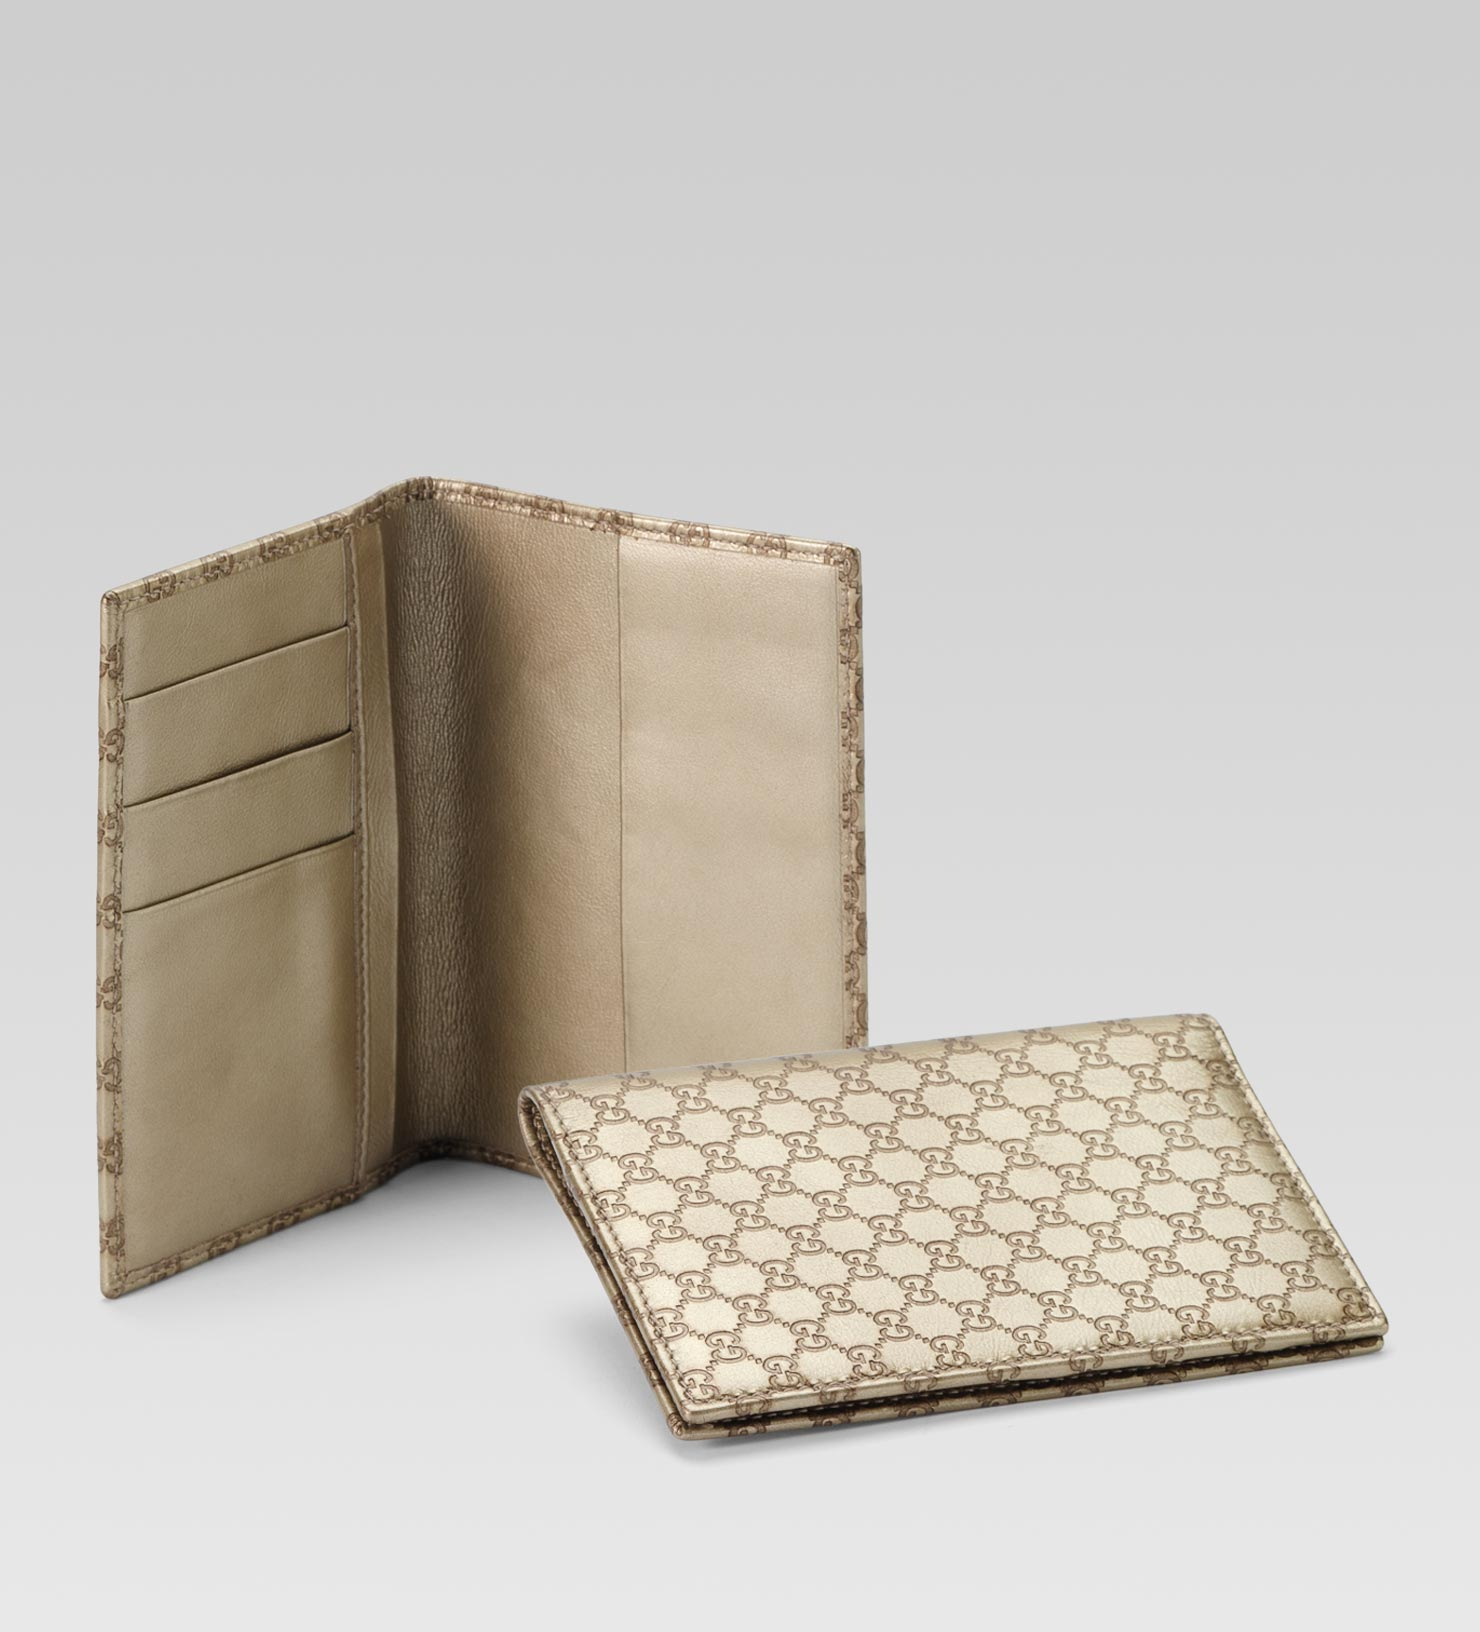 d41daedec458 Gucci Passport Case in Metallic for Men - Lyst